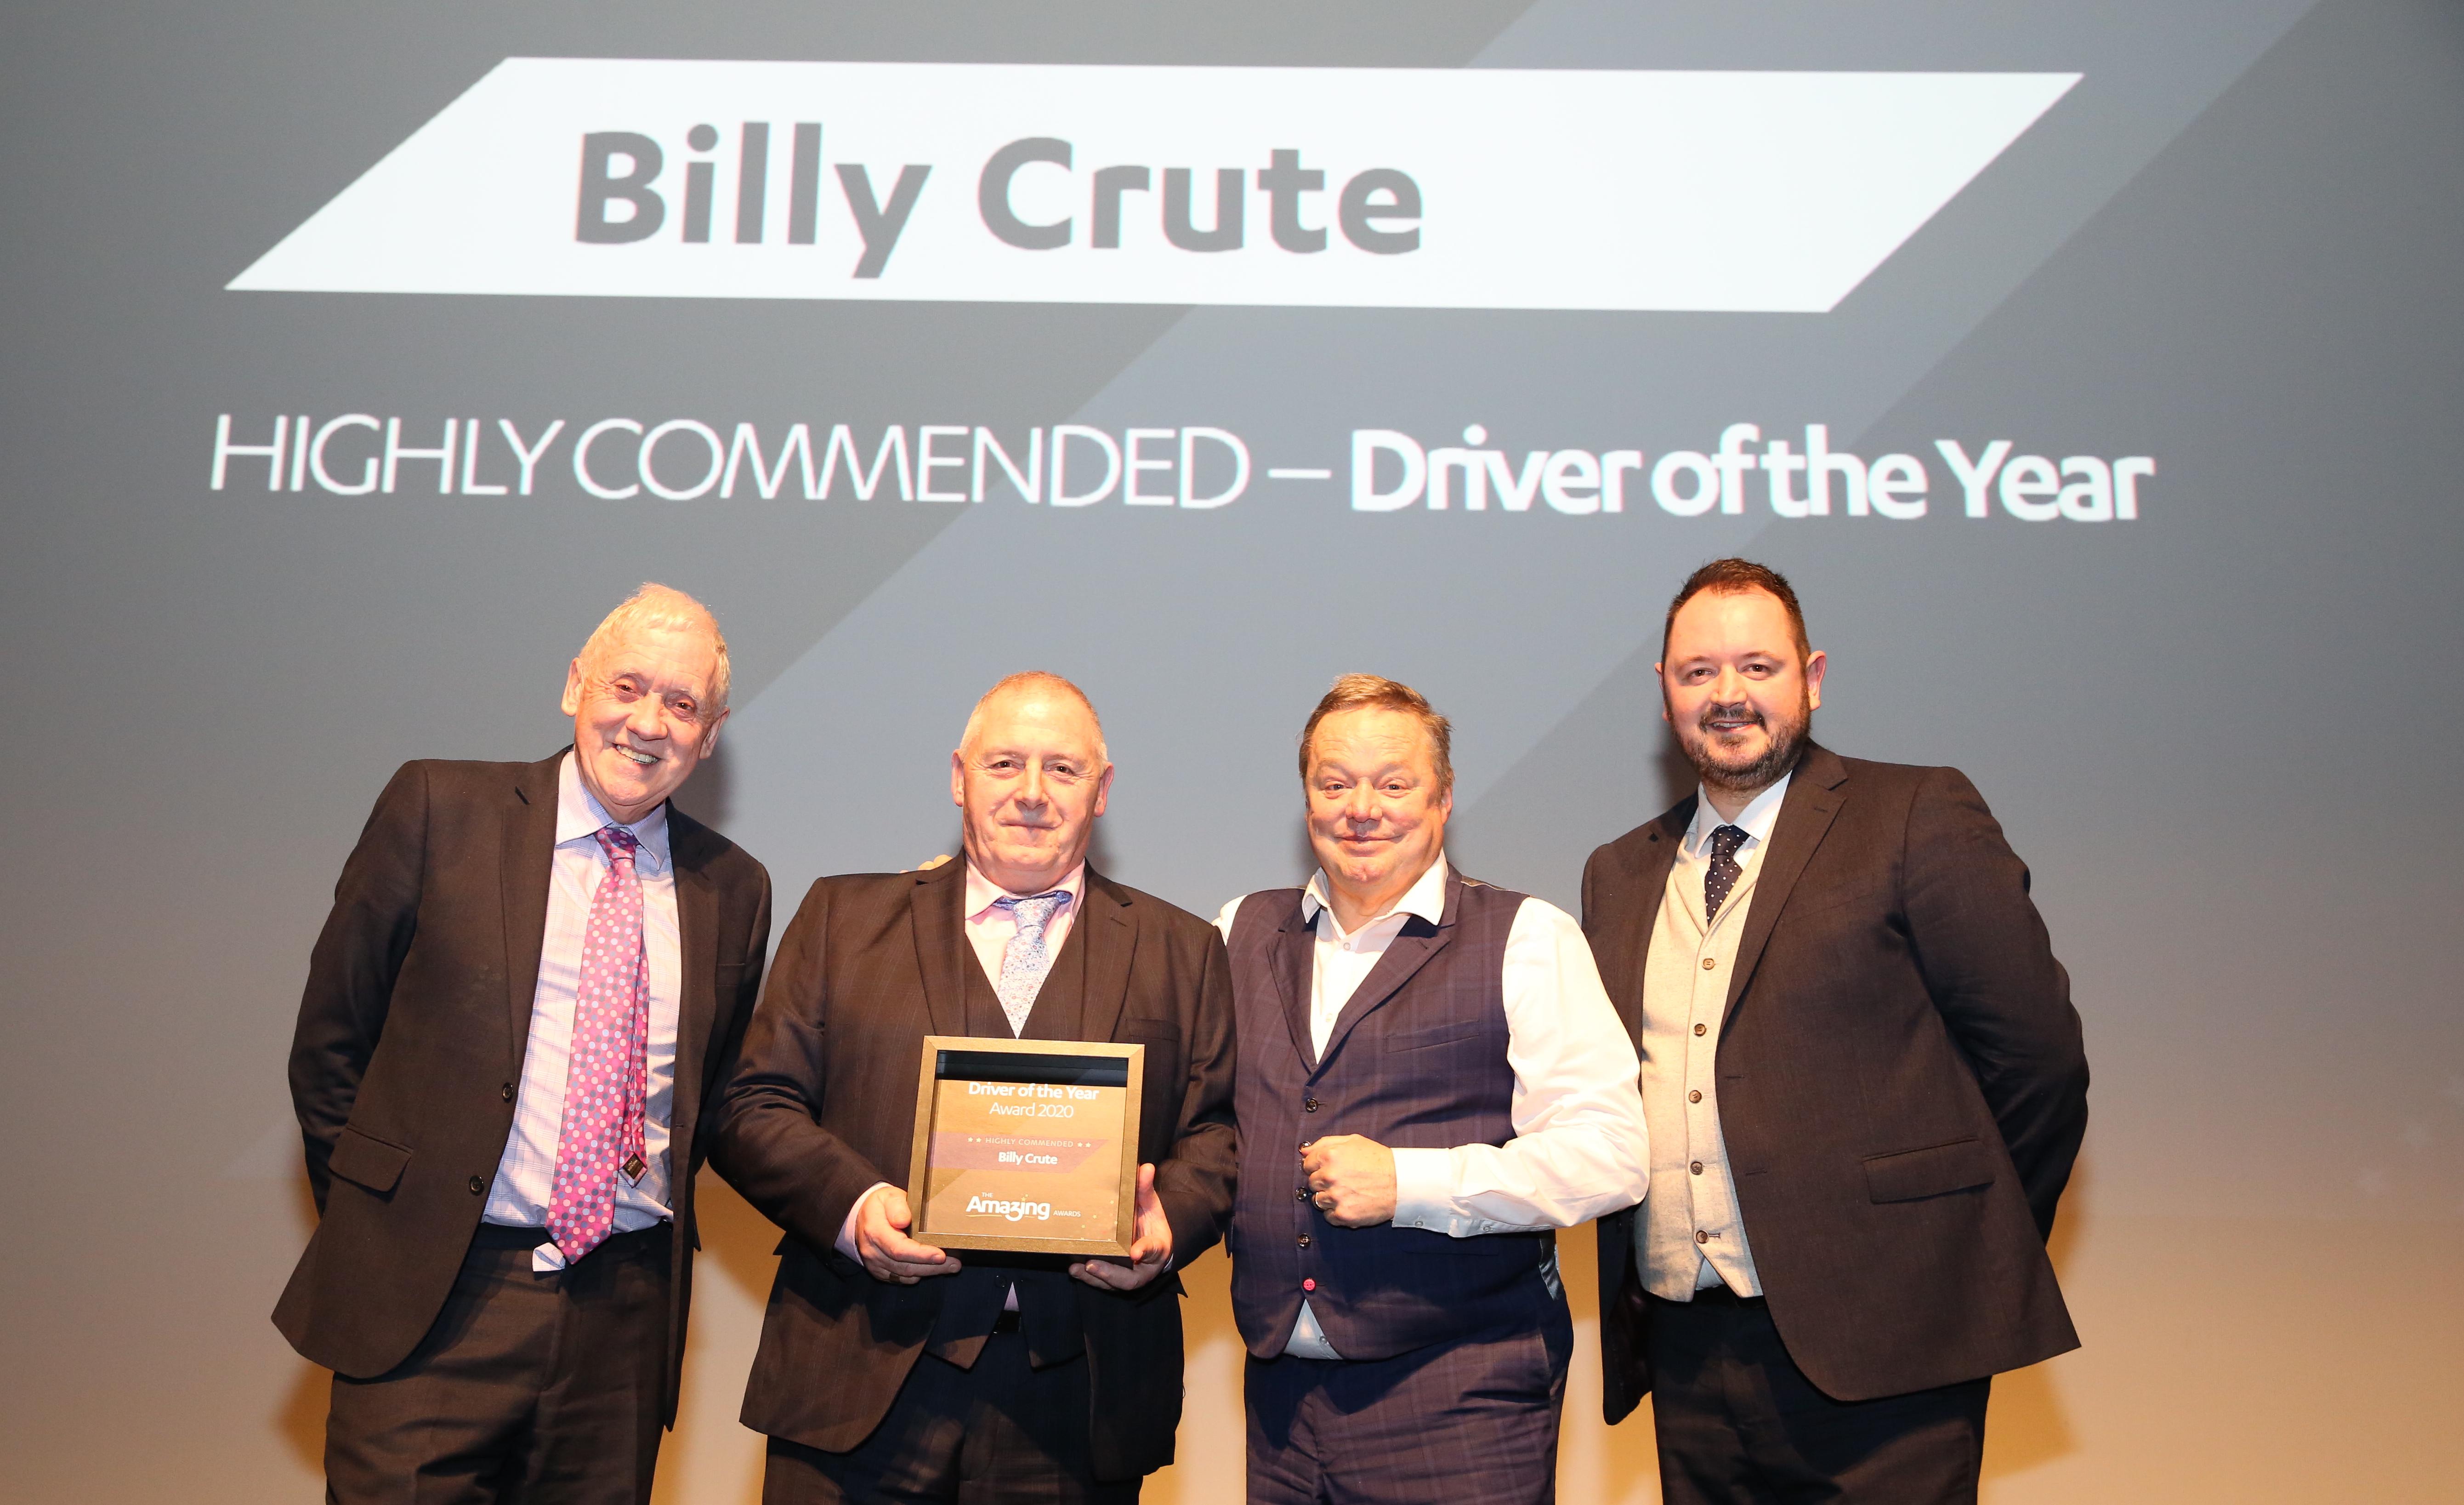 Billy Crute